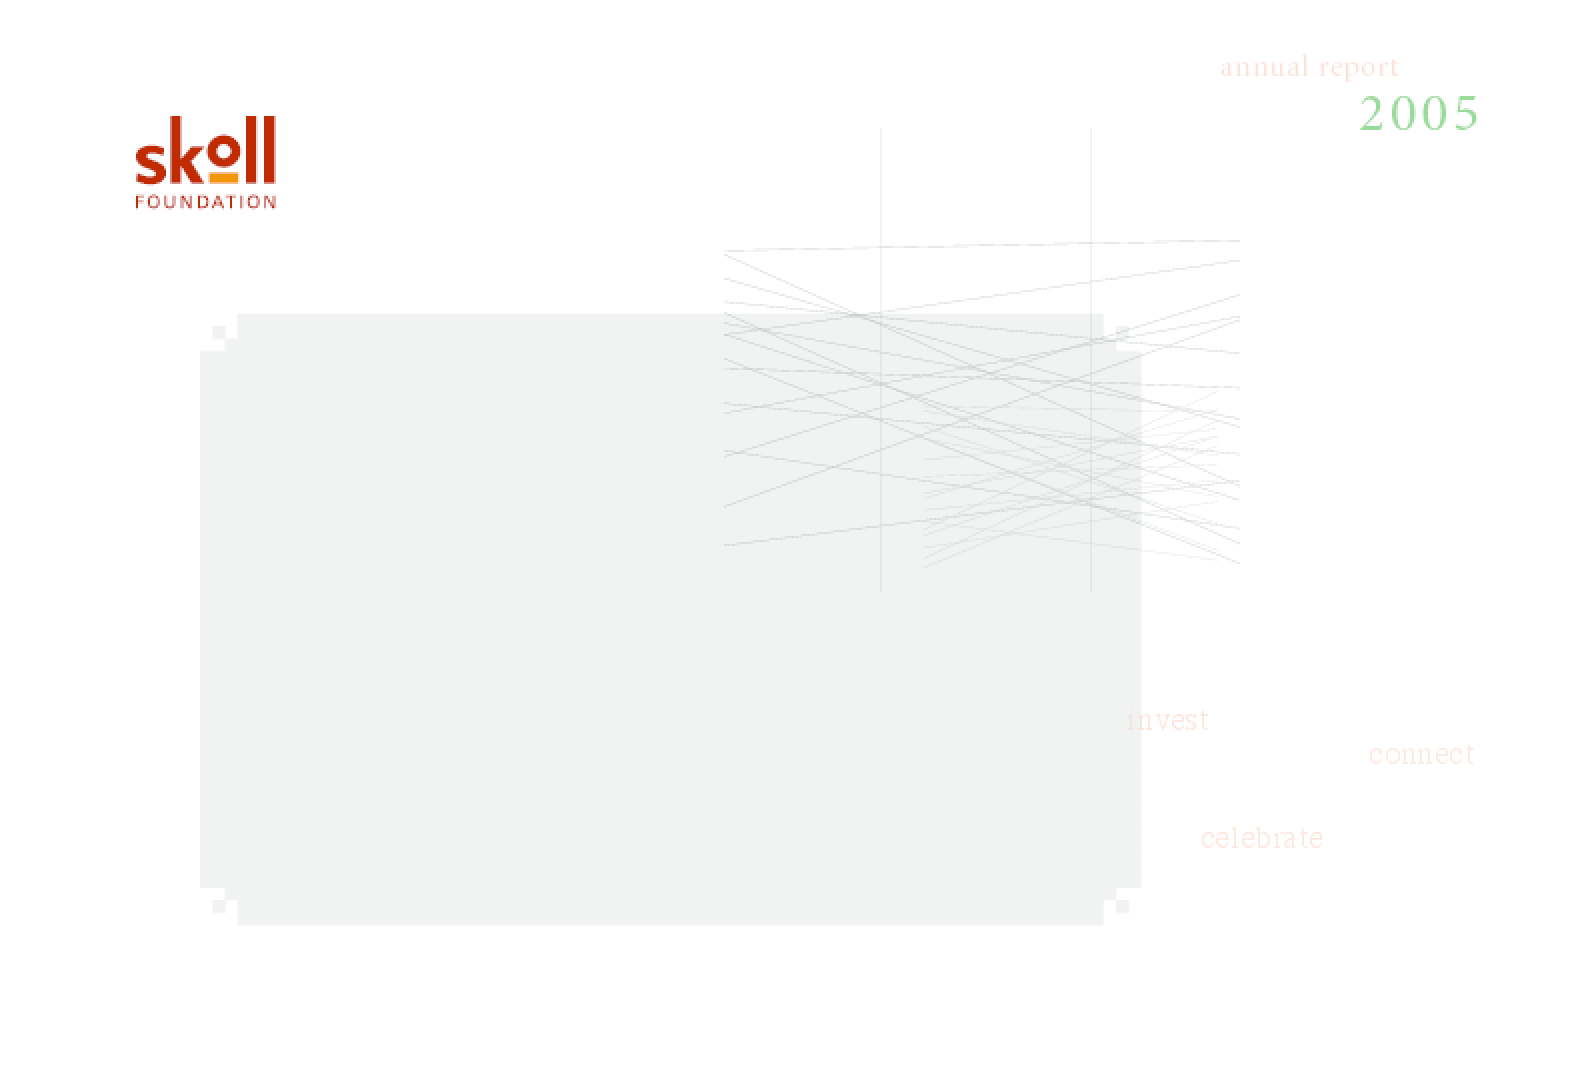 Skoll Foundation - 2005 Annual Report